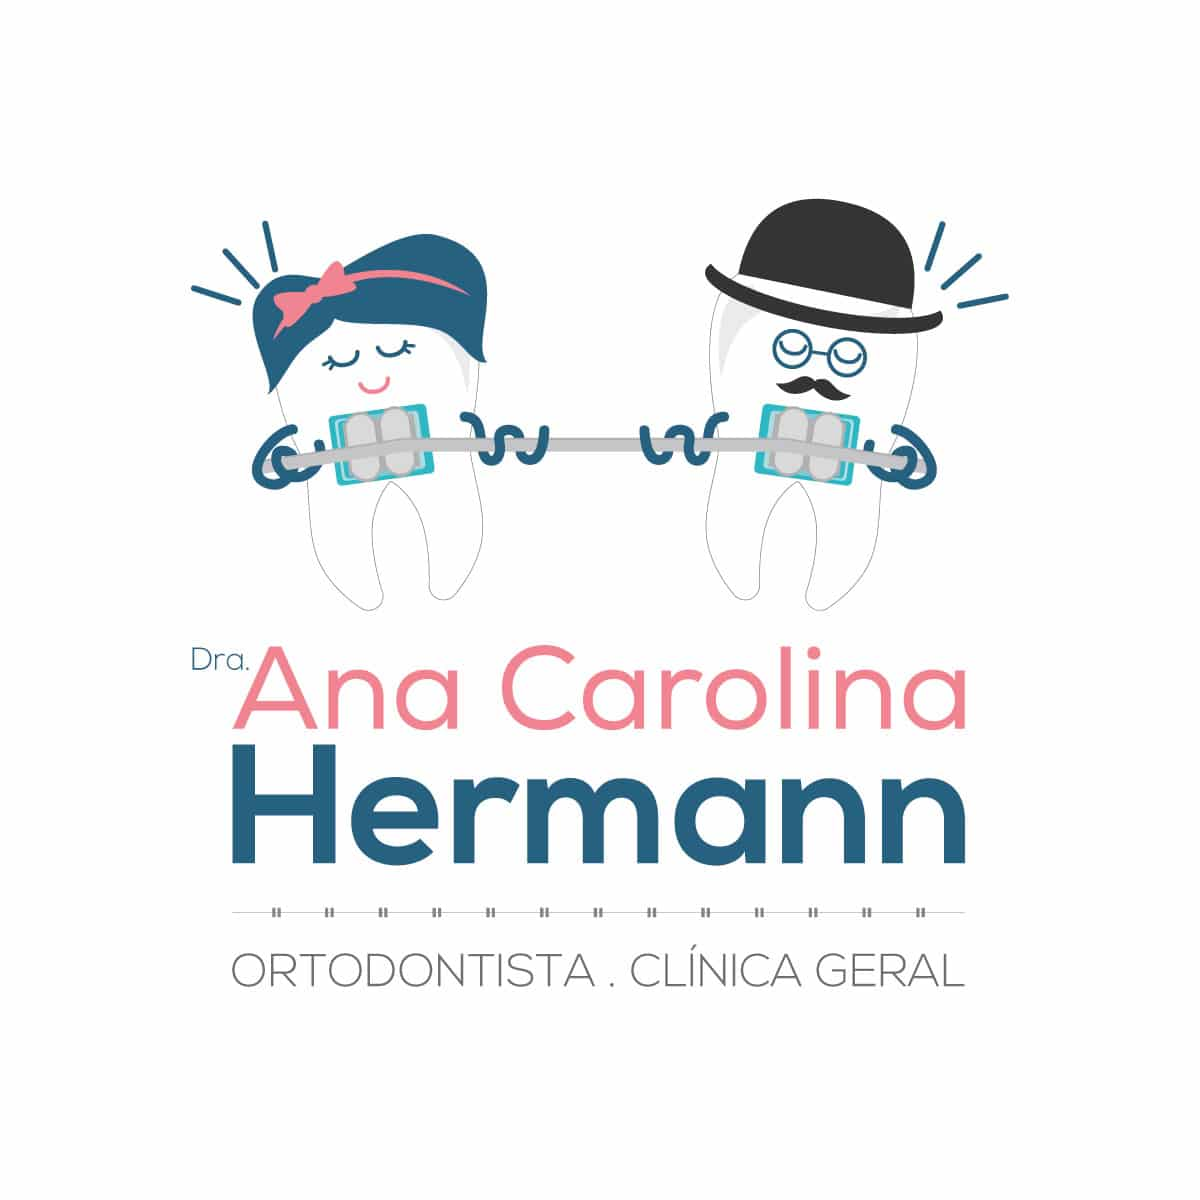 Dra. Ana Carolina Hermann | Dentista em Coromandel